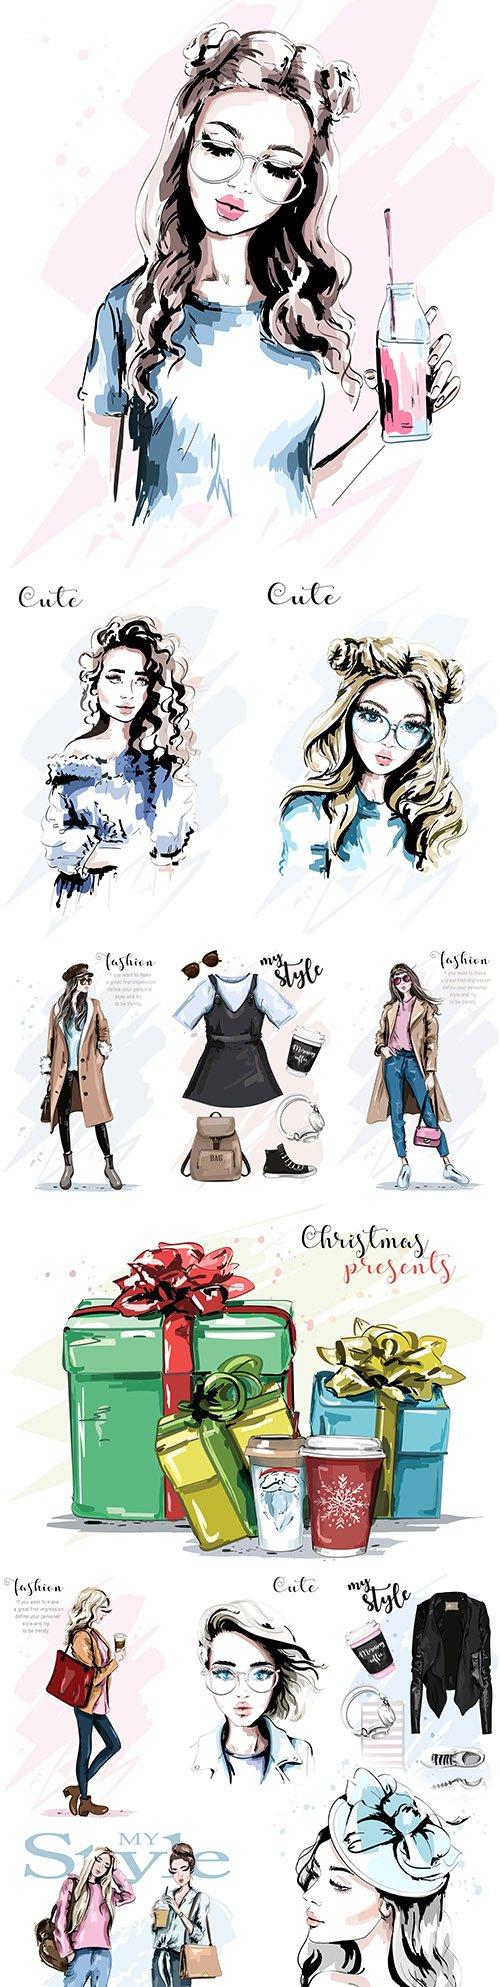 Women pose for fashion cover stylish design illustrations